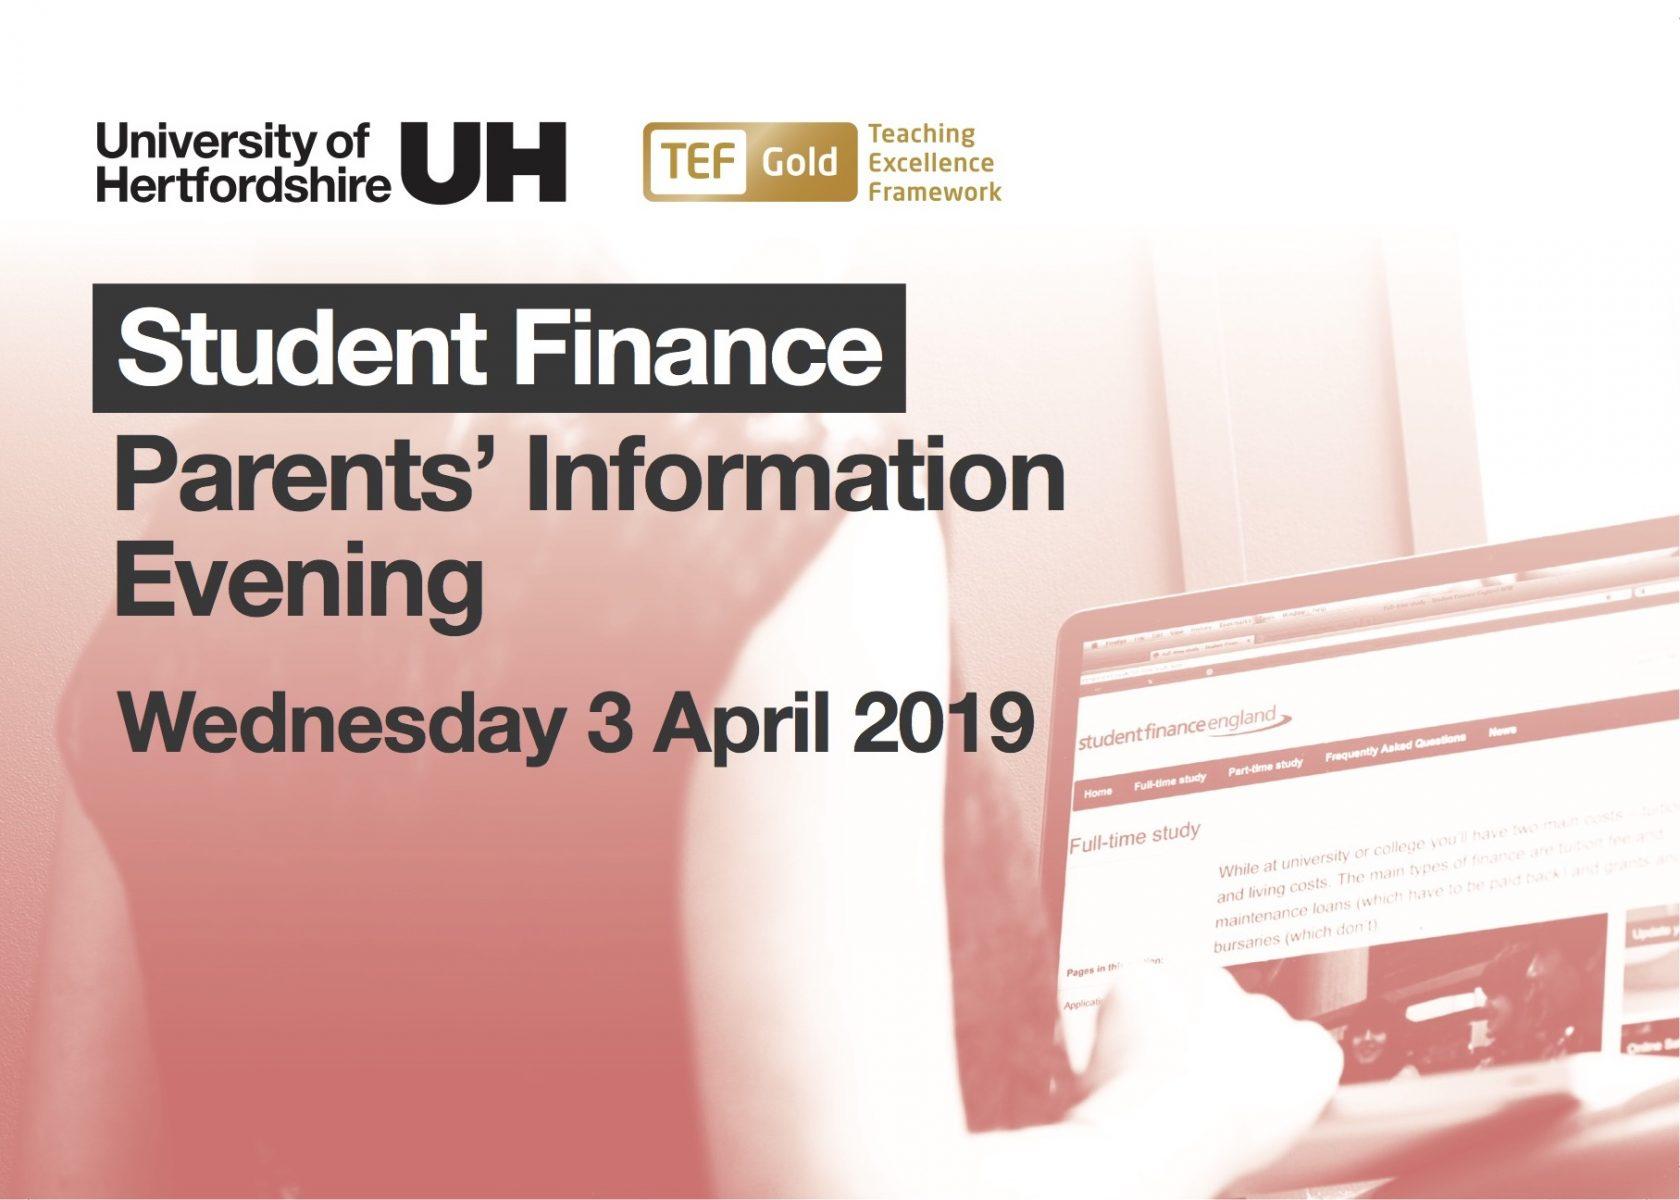 Student Finance Parents' Information Evening